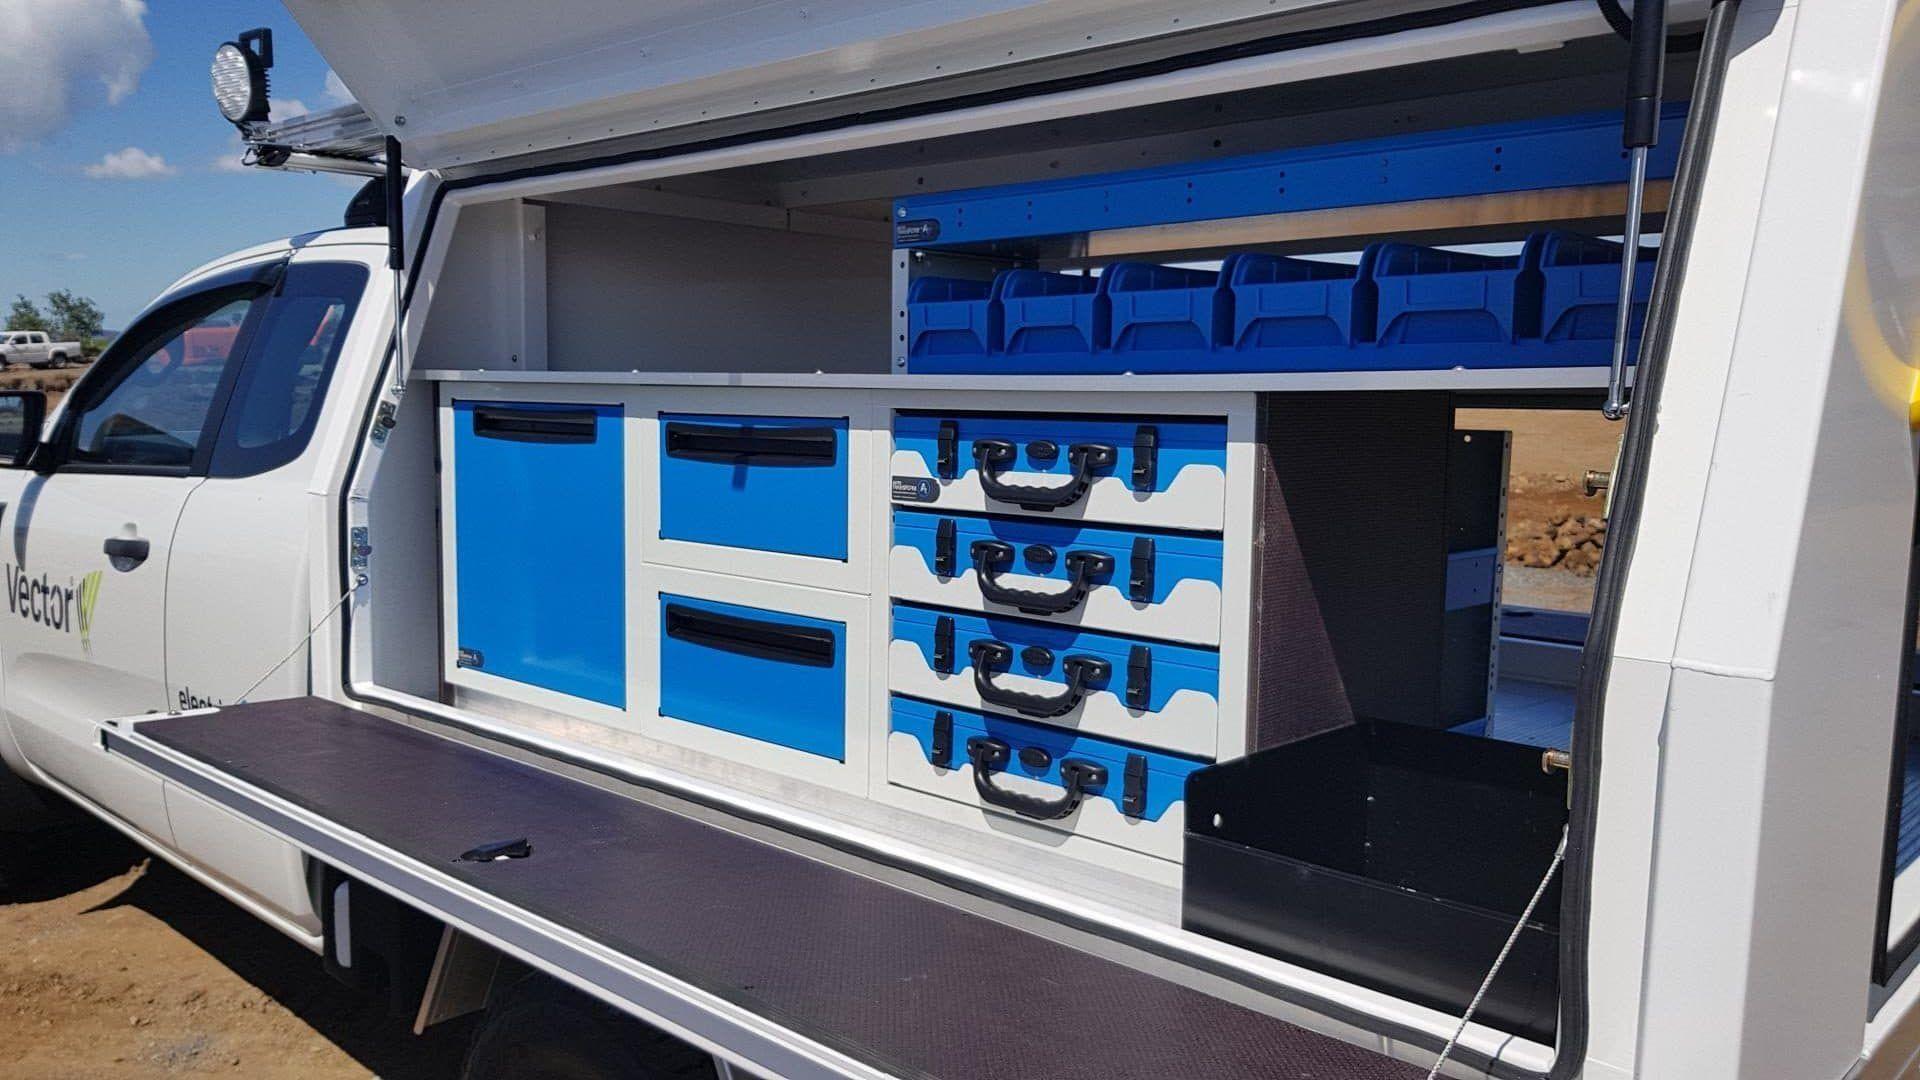 Modular drawers and shelving for utes